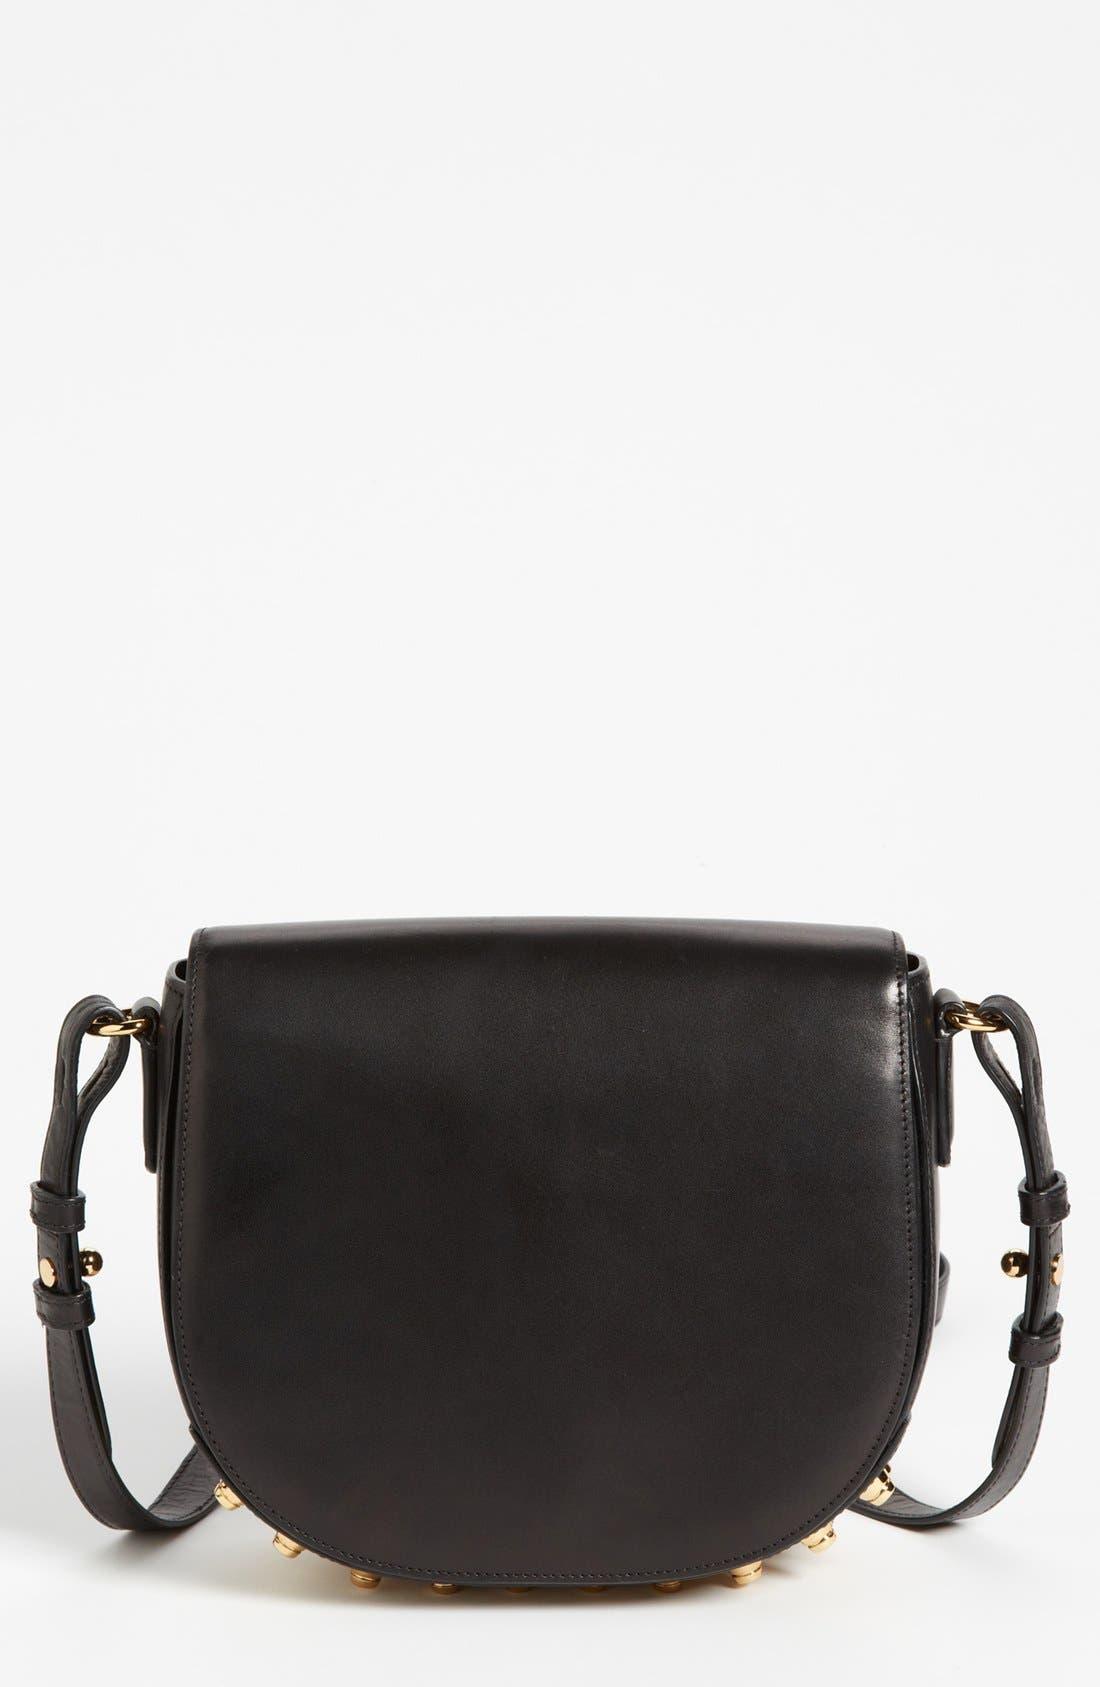 Main Image - Alexander Wang 'Lia - Small' Leather Crossbody Bag